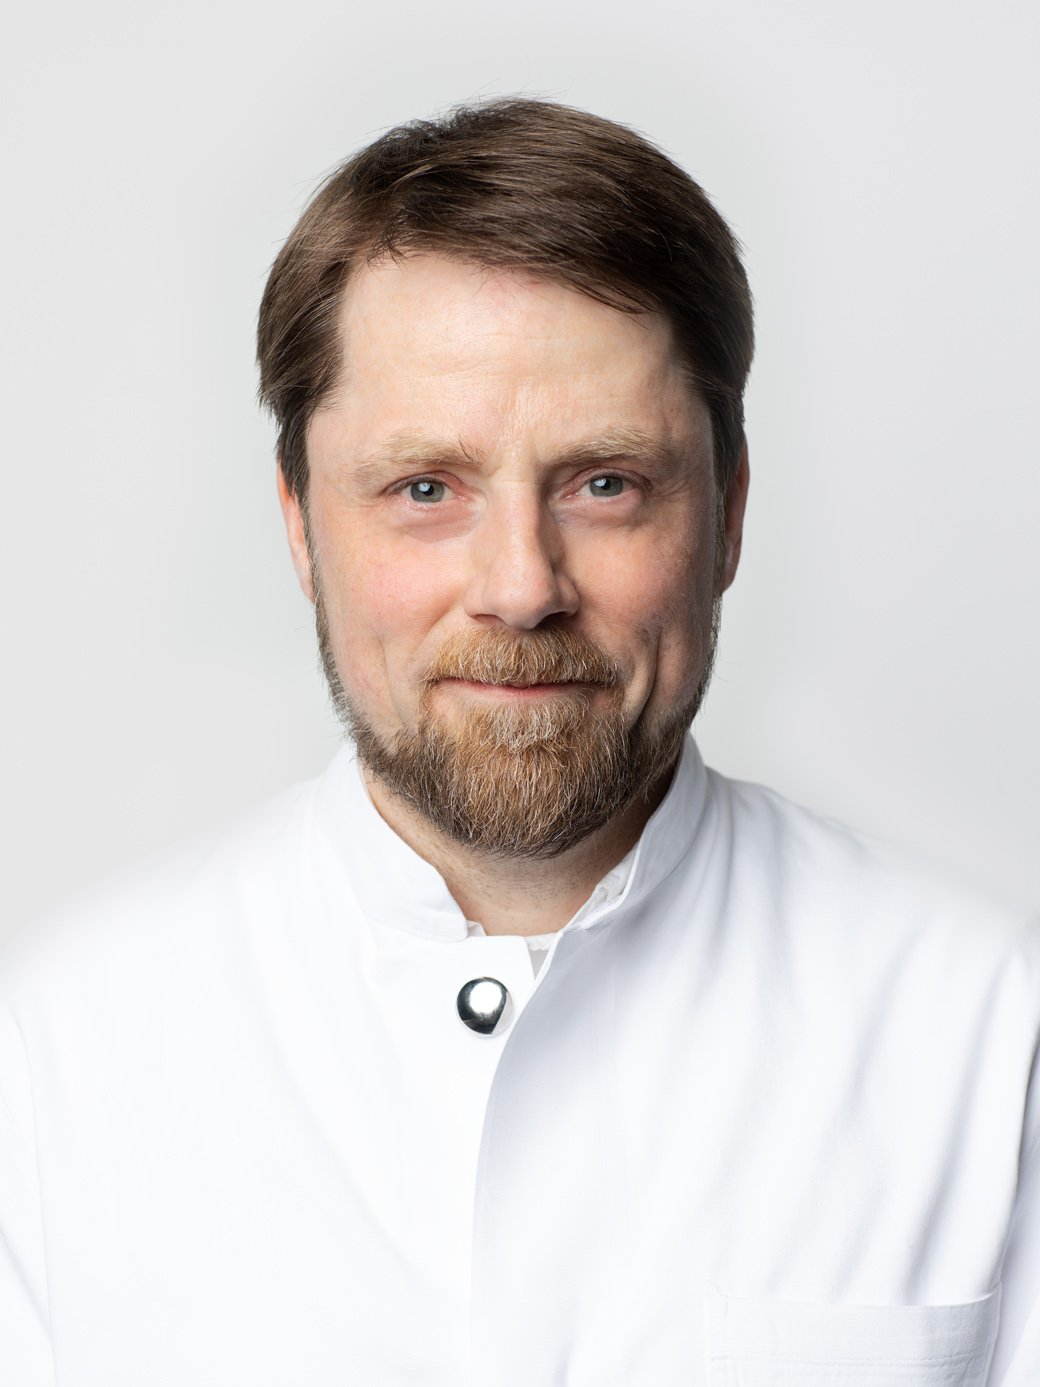 Olaf Greve